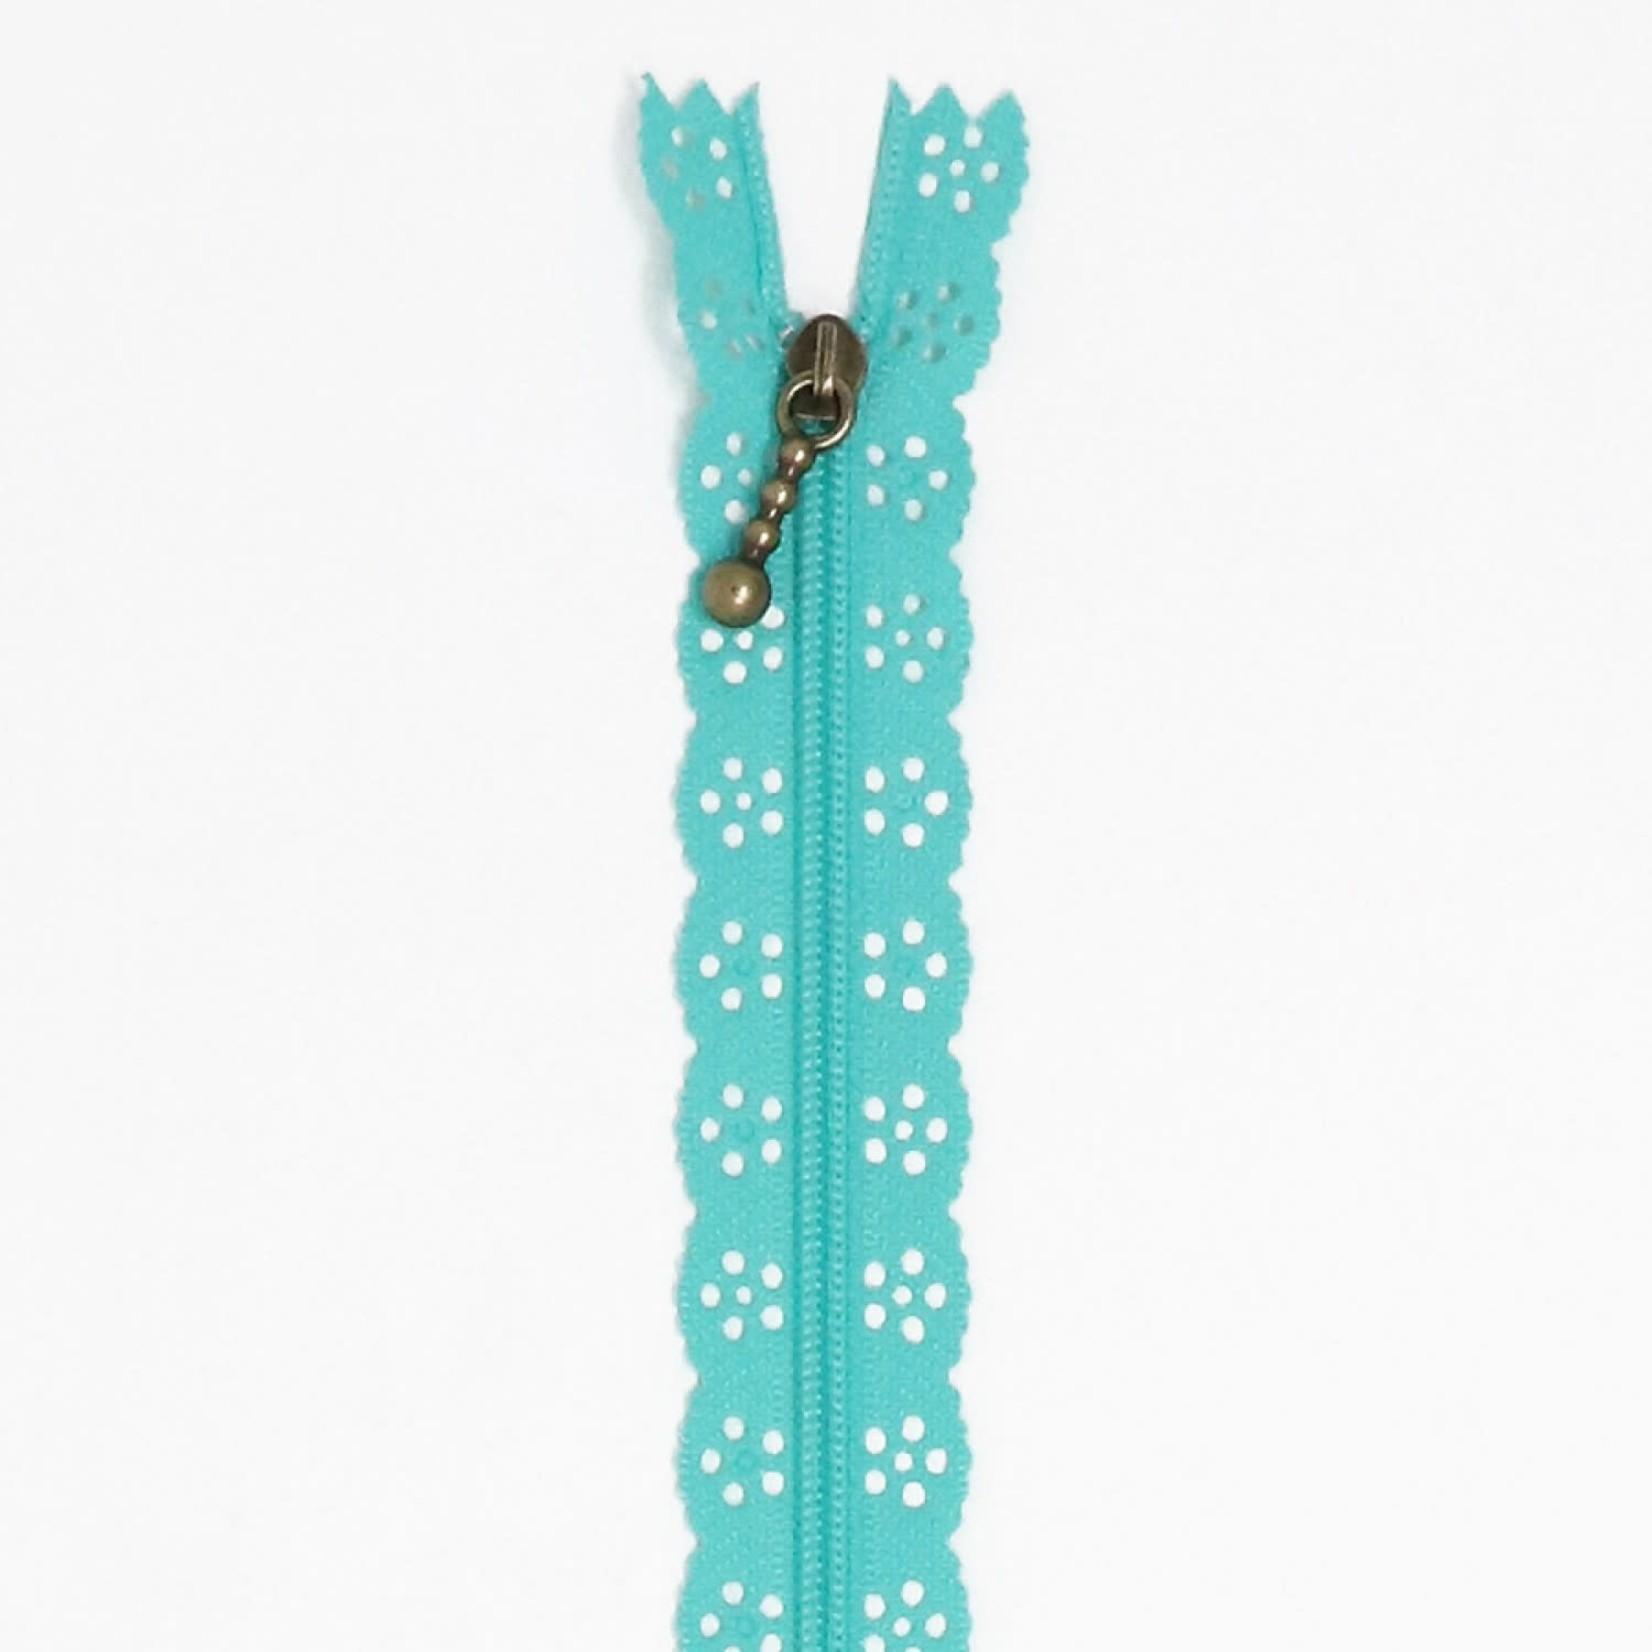 "KIMBERBELL DESIGNS Lace Zipper 14"" - Robin's Egg Blue"